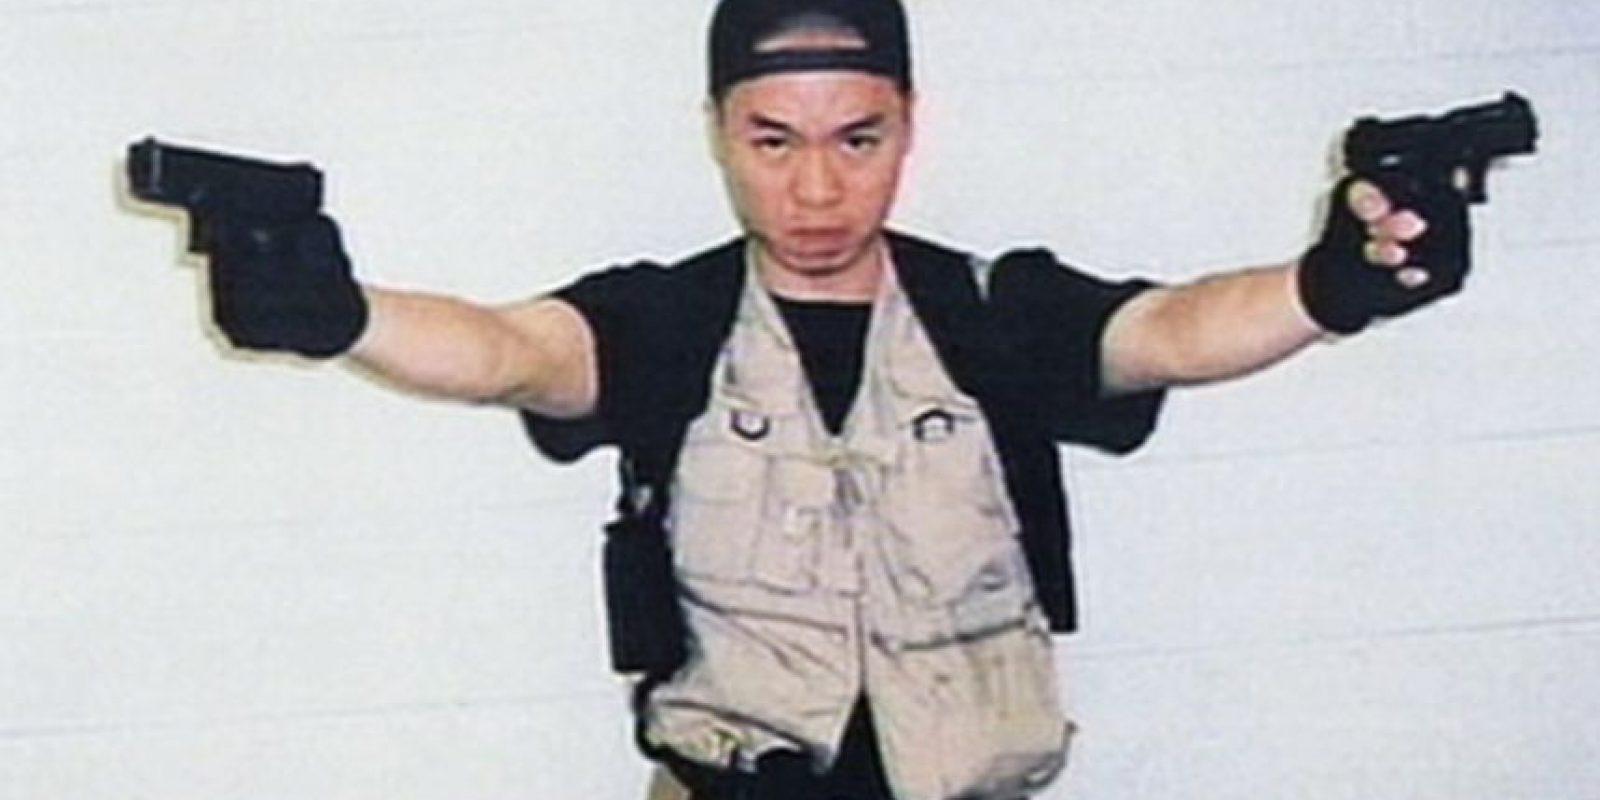 El atacante fue Seung-Hui Cho, de origen sudcoreano Foto:Wikimedia